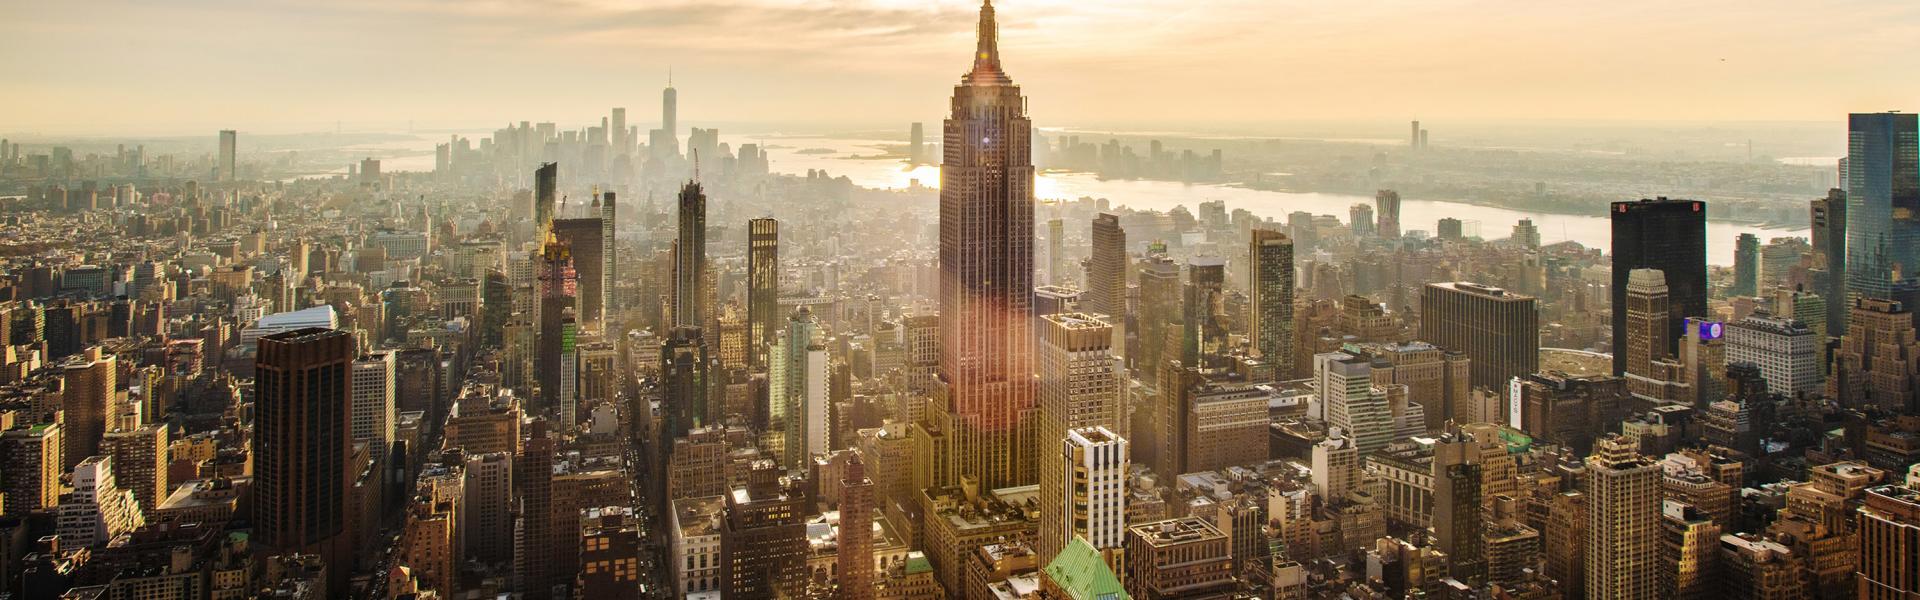 One Vanderbilt, NYC Skyline, Manhattan, NYC